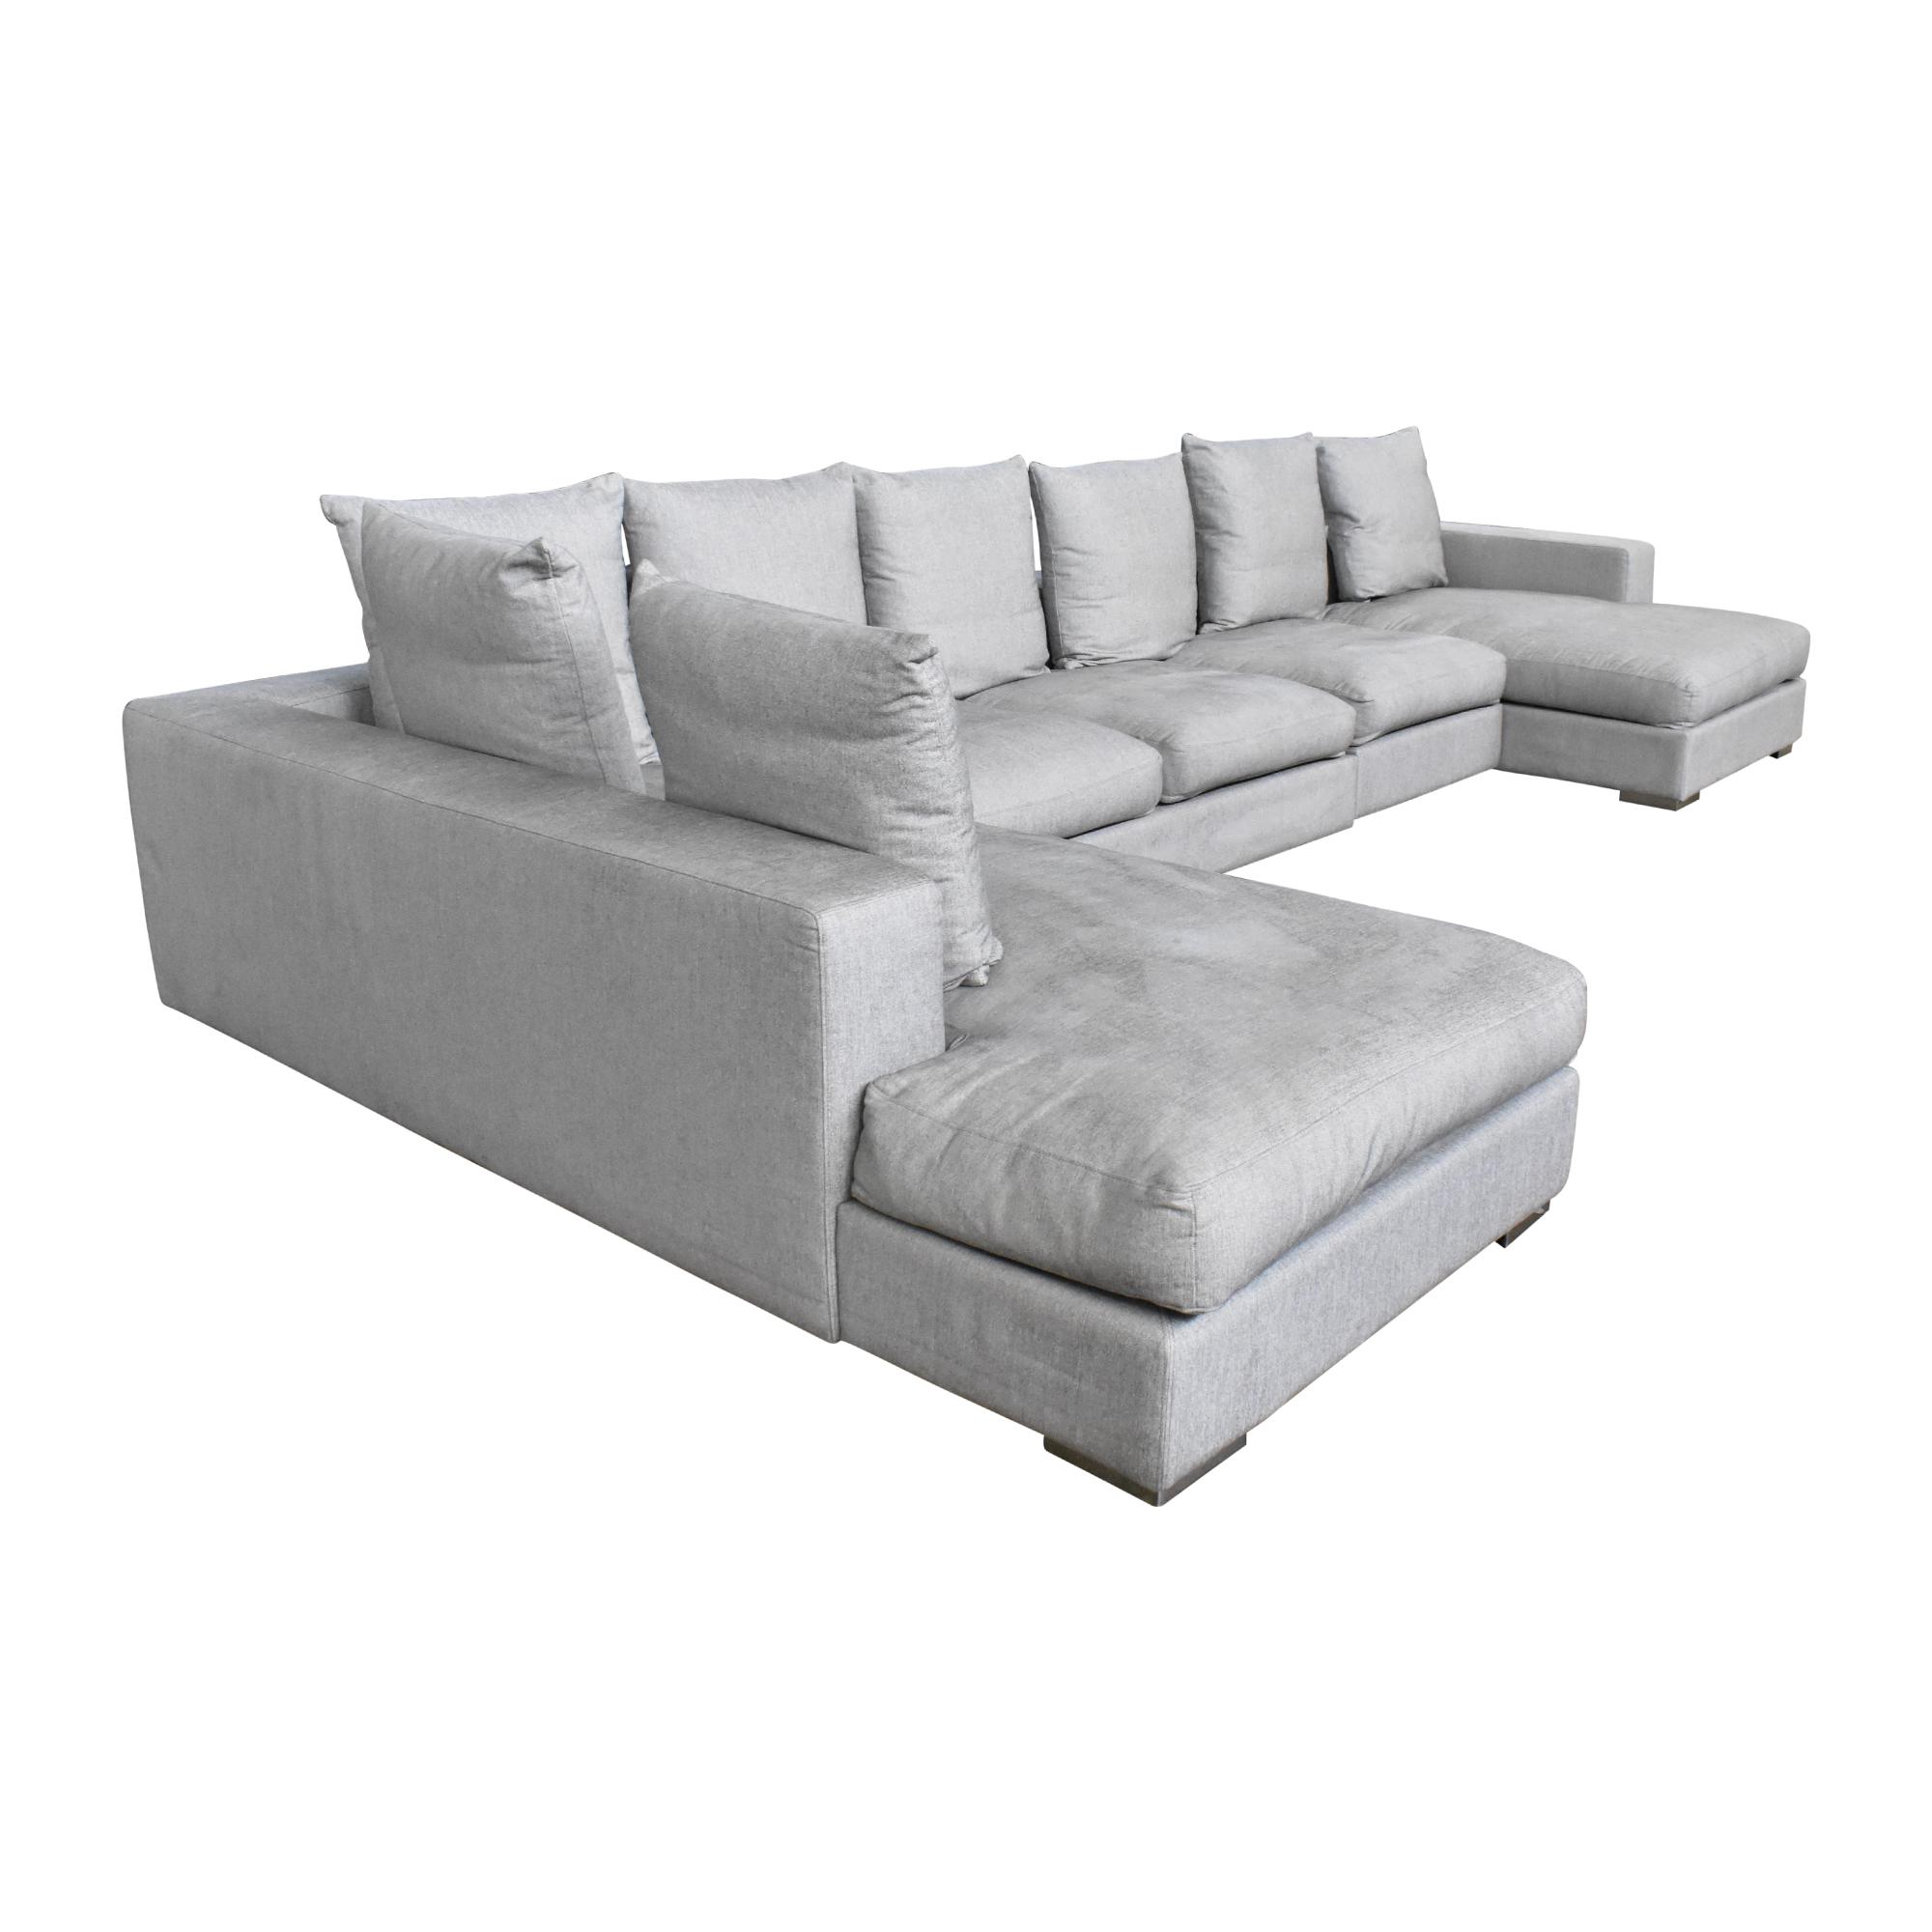 BoConcept BoConcept Cenova Sectional Sofa pa